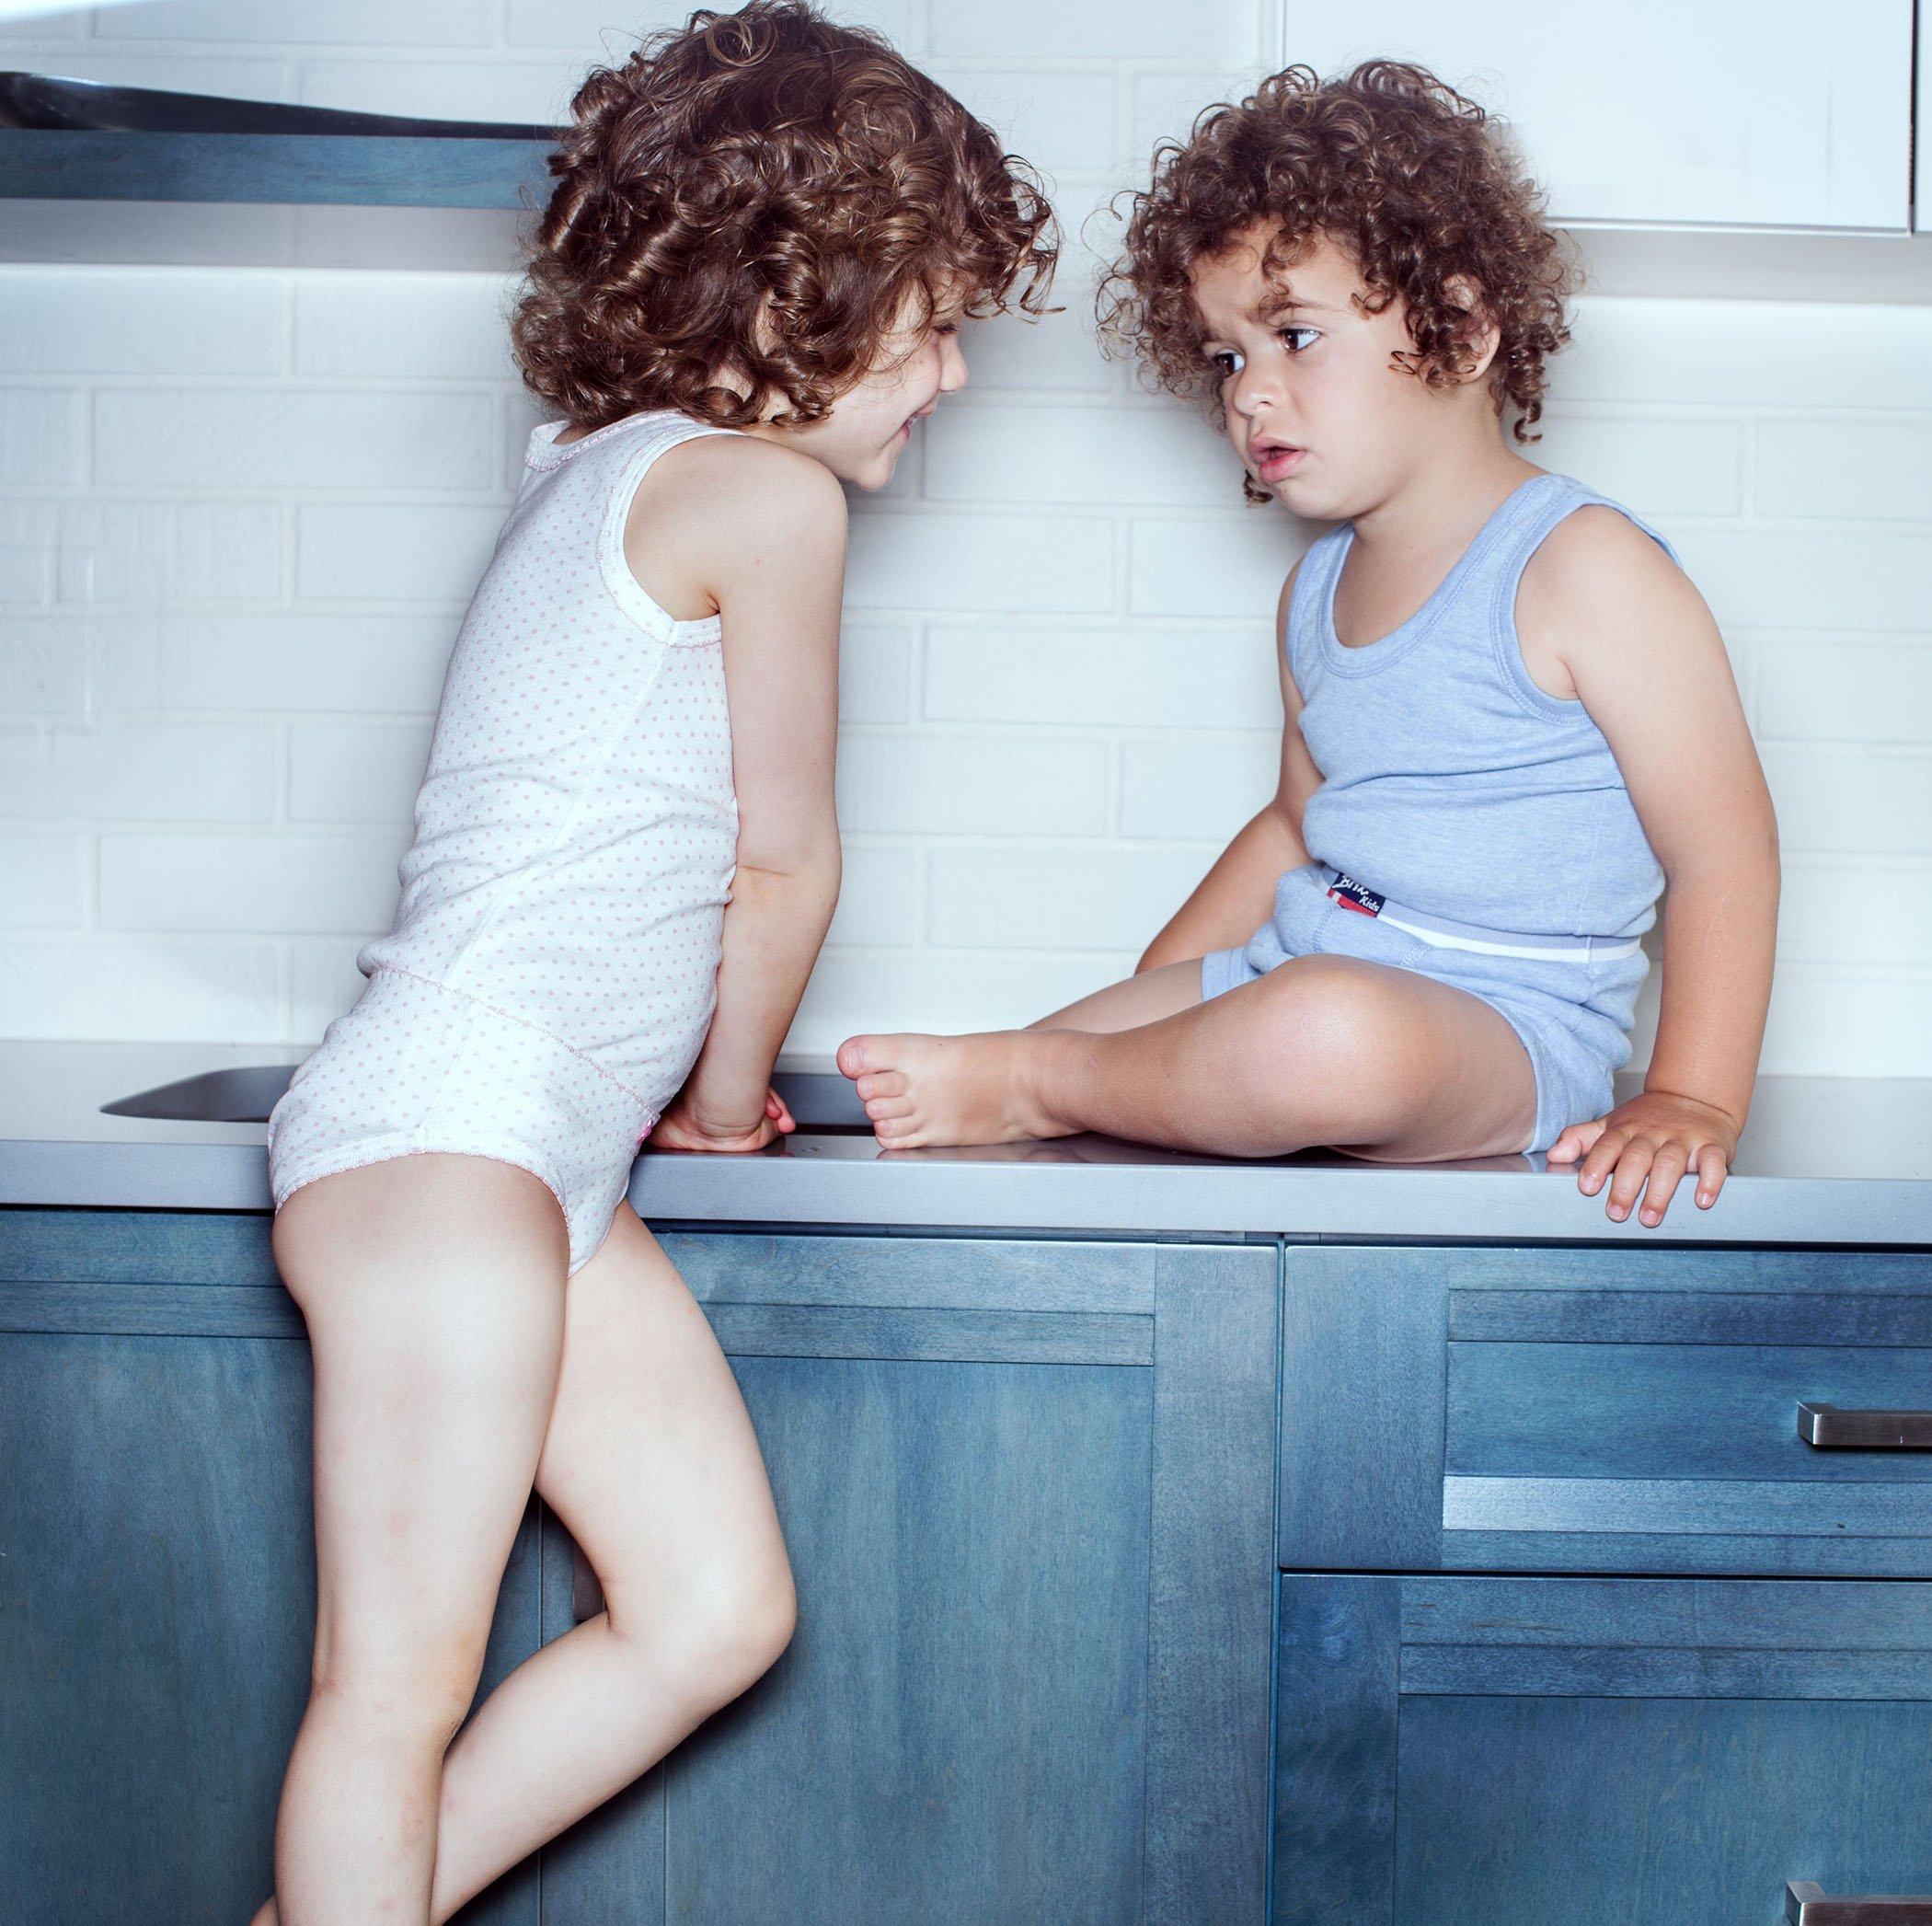 Amoureux Bebe Girls Cami Undershirts- Tagless Cotton Tank Tops-Pink/White, 3 Pk (8-9 Yrs) by Amoureux Bebe (Image #3)